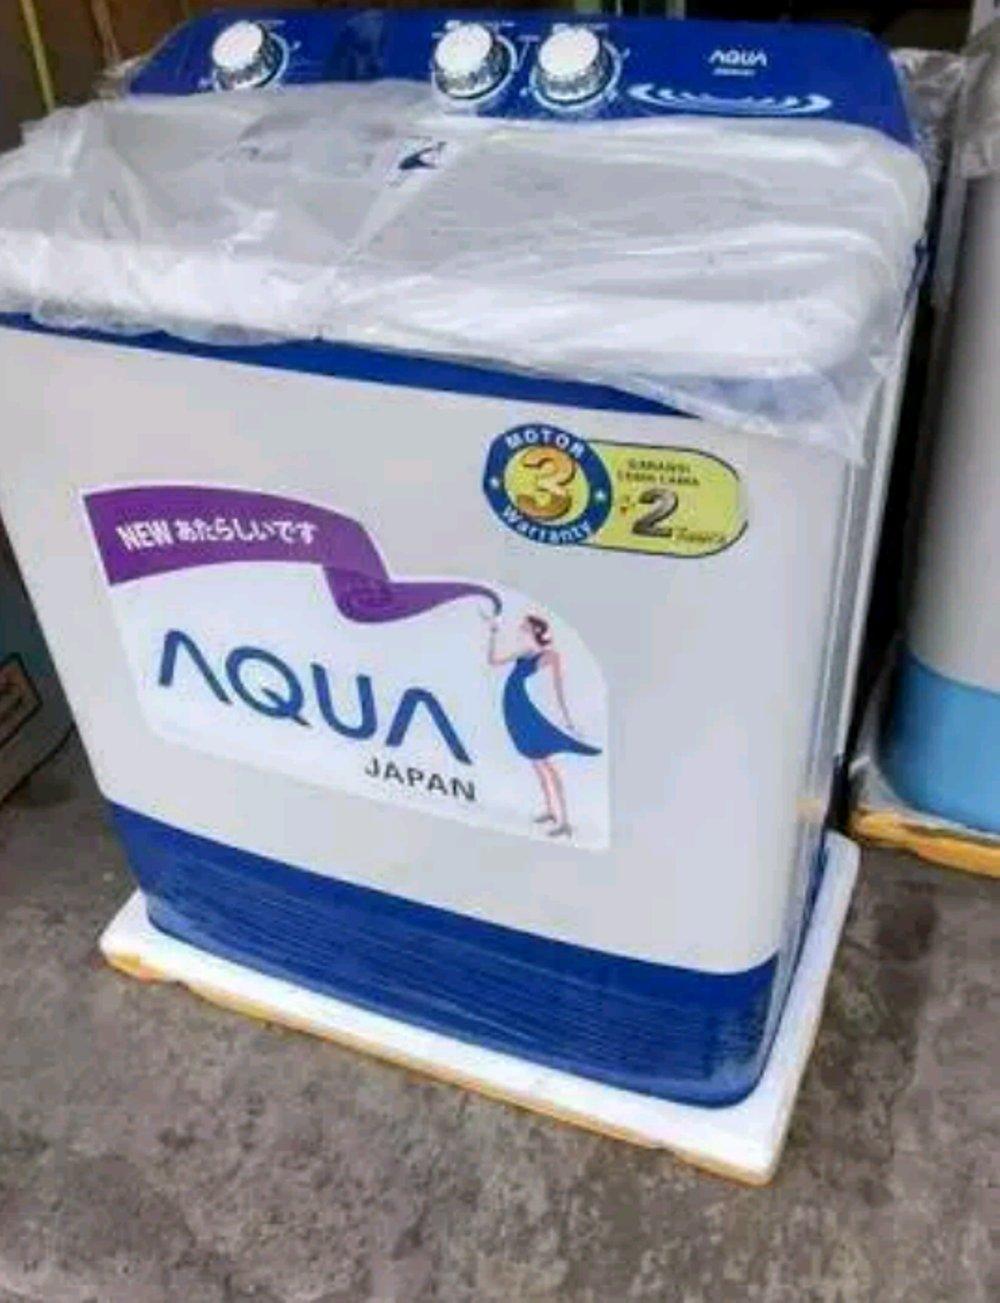 Features Aqua Mesin Cuci 2 Tabung Qw 871xt Dan Harga Terbaru 9kg Qw980xt Putih Free Ongkir Jabodetabek 3